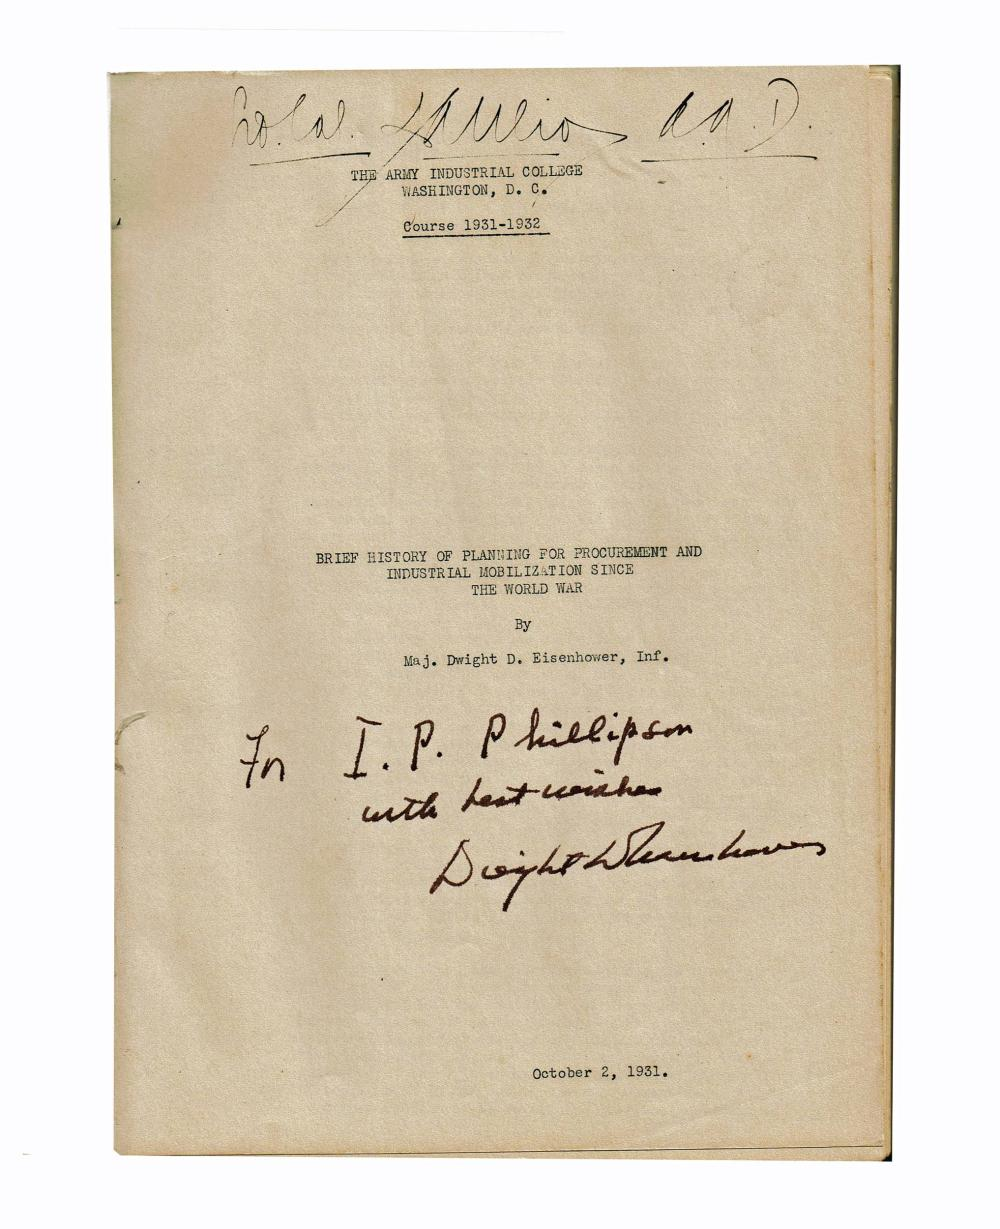 Eisenhower Signed Presentation Copy Planning for Industrial Mobilization Since the World War, Ex-Forbes